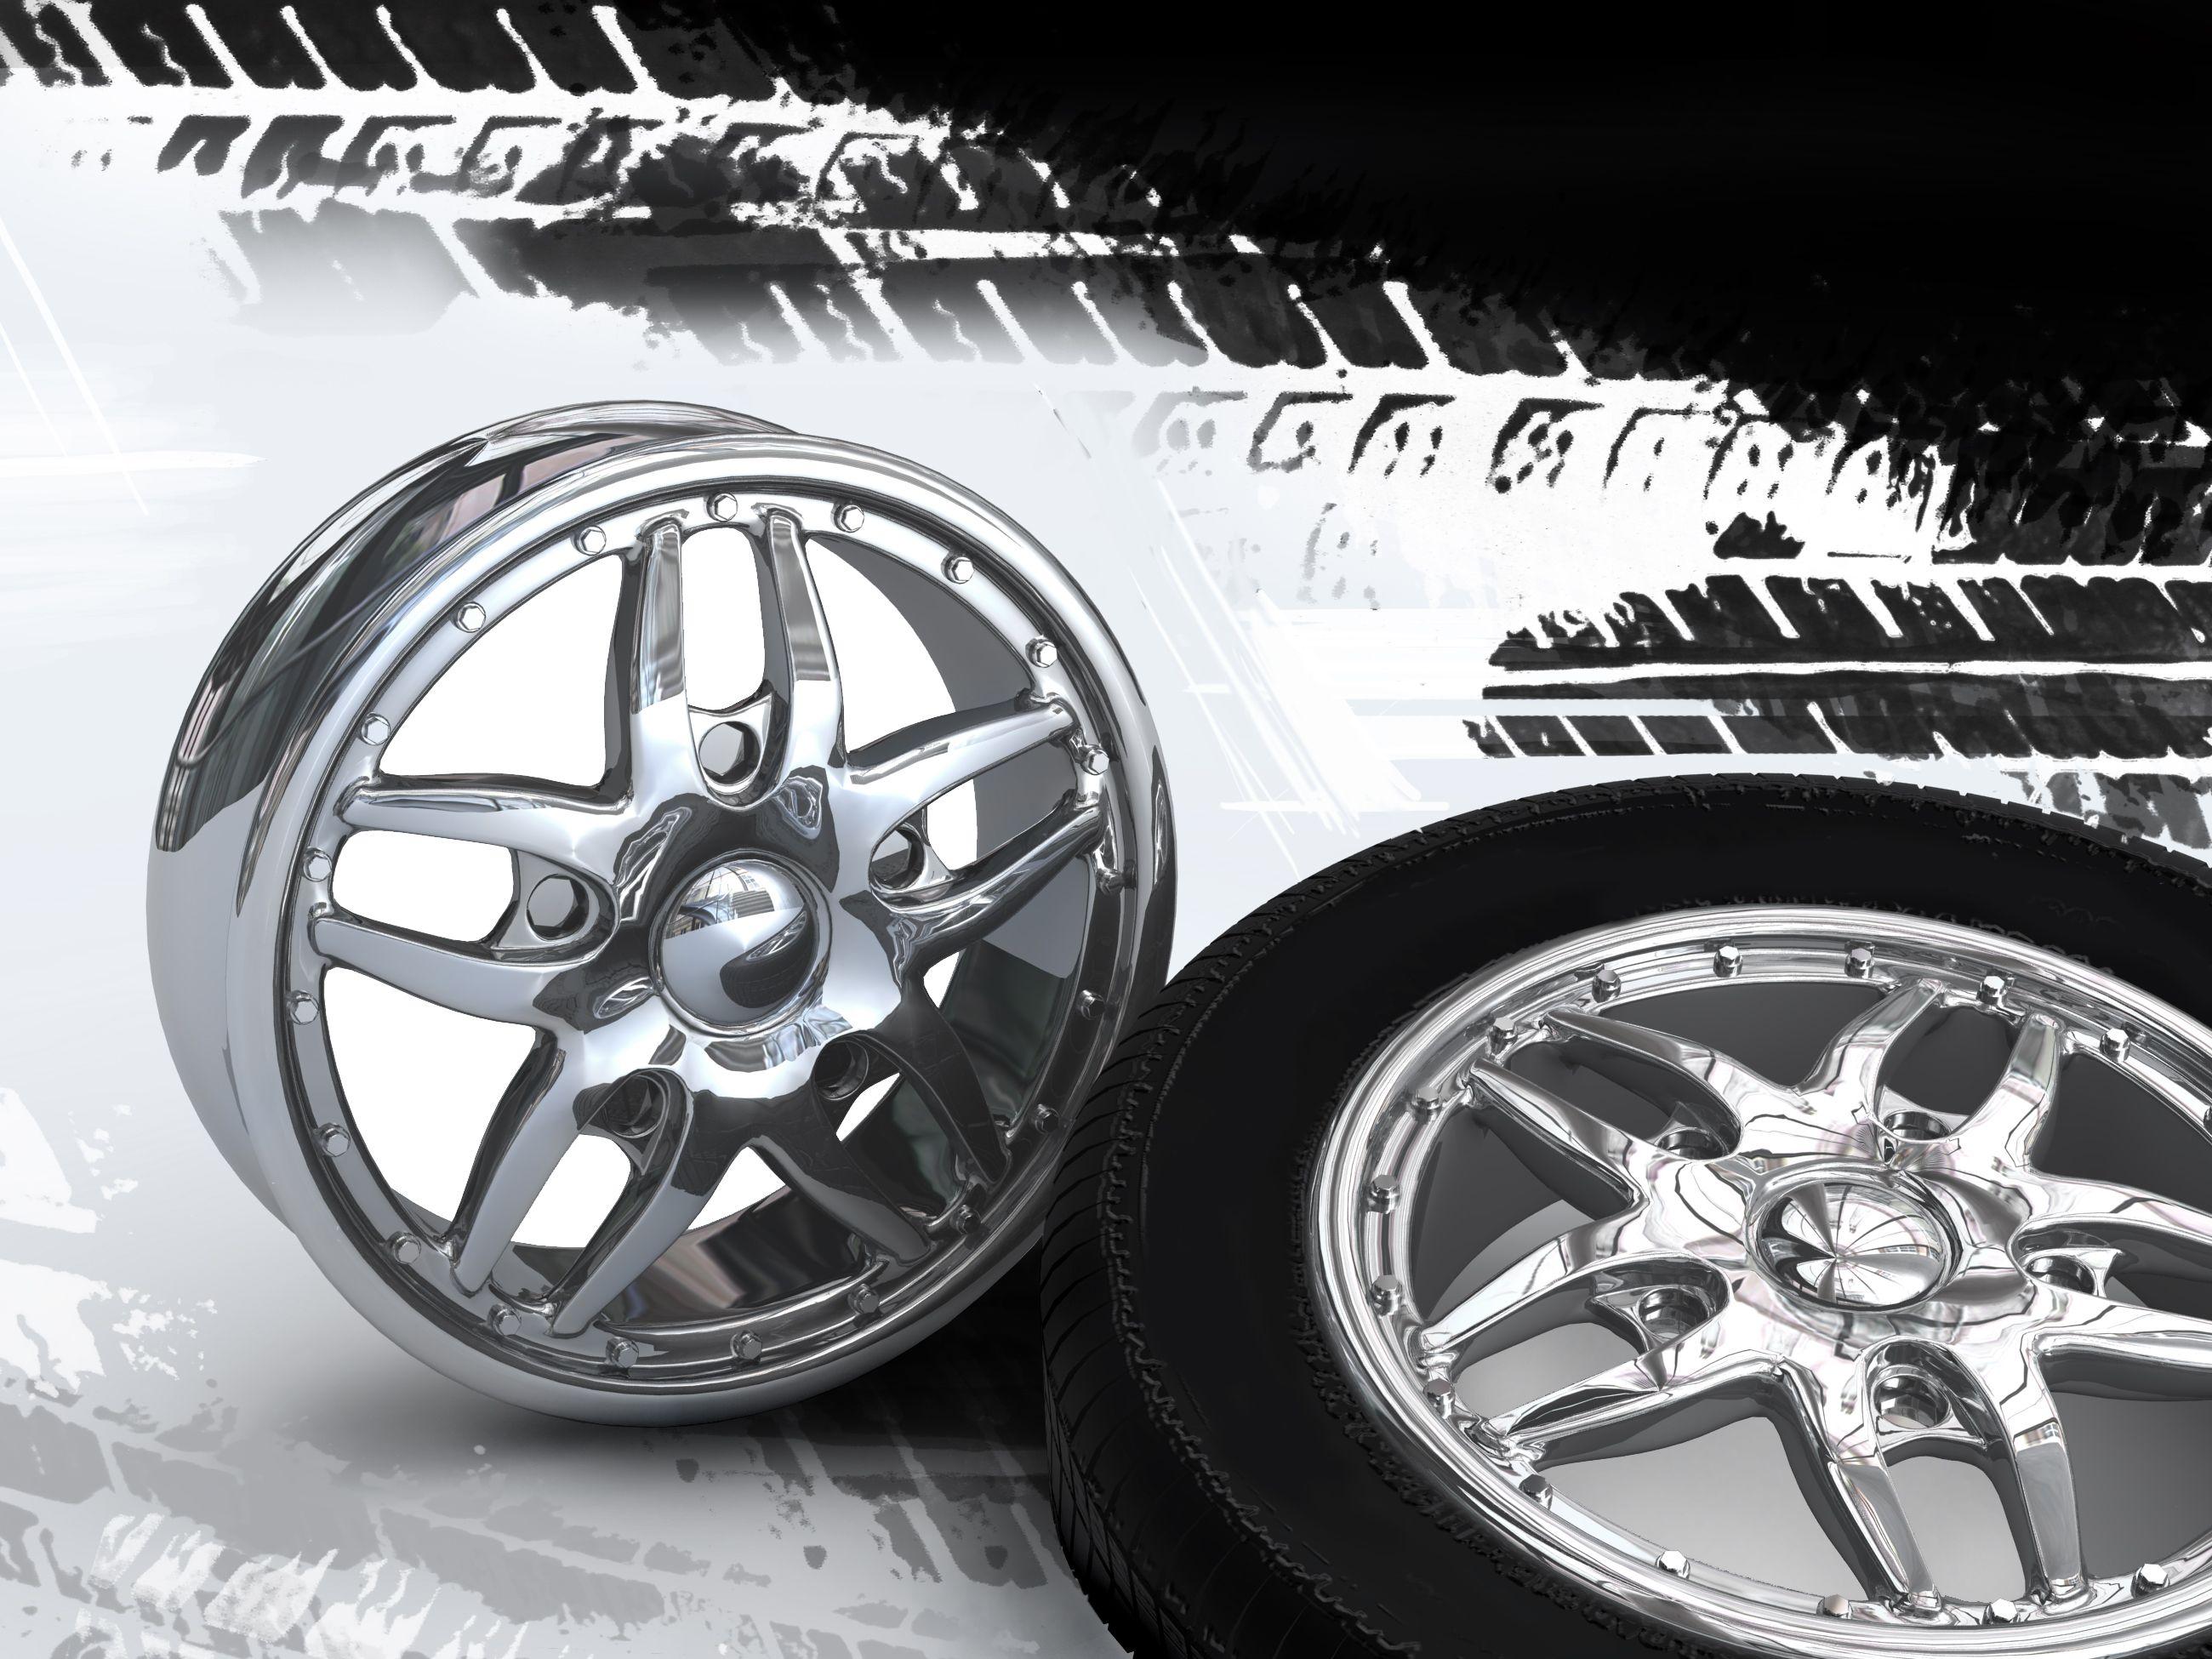 Neumáticos: Servicios de Asua-Berri Motor Old School